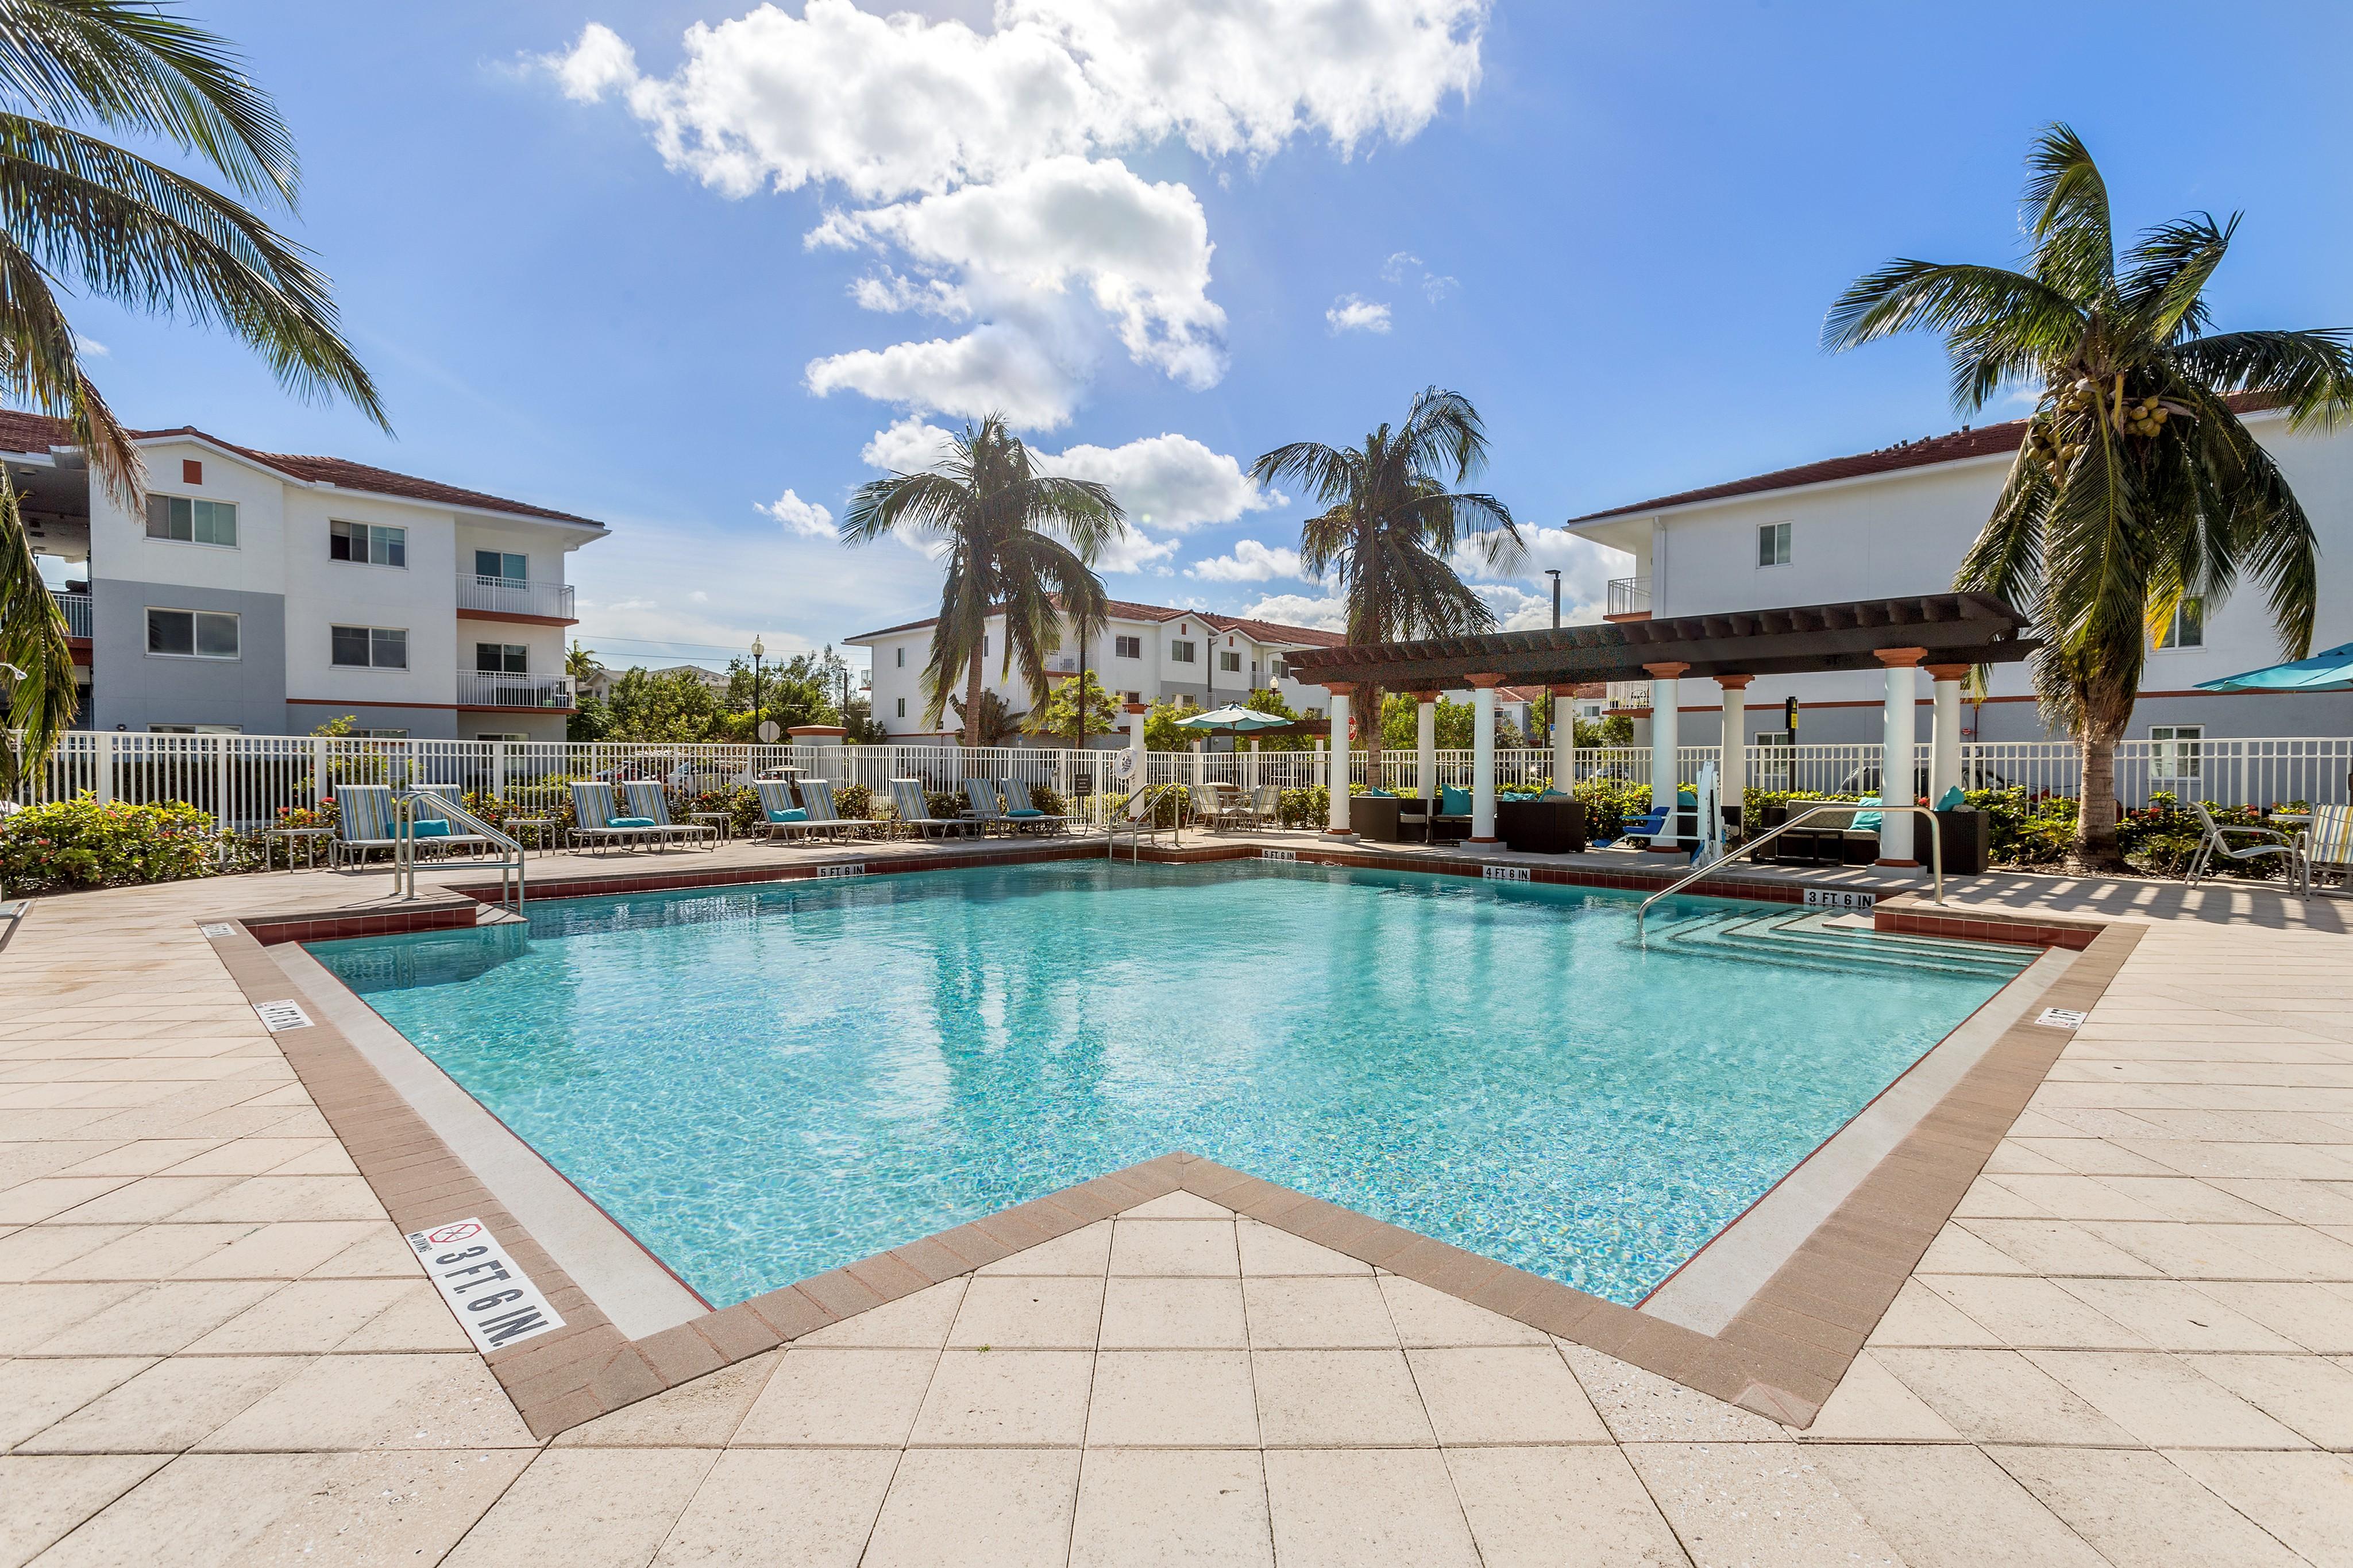 Advenir at Biscayne Shores for rent